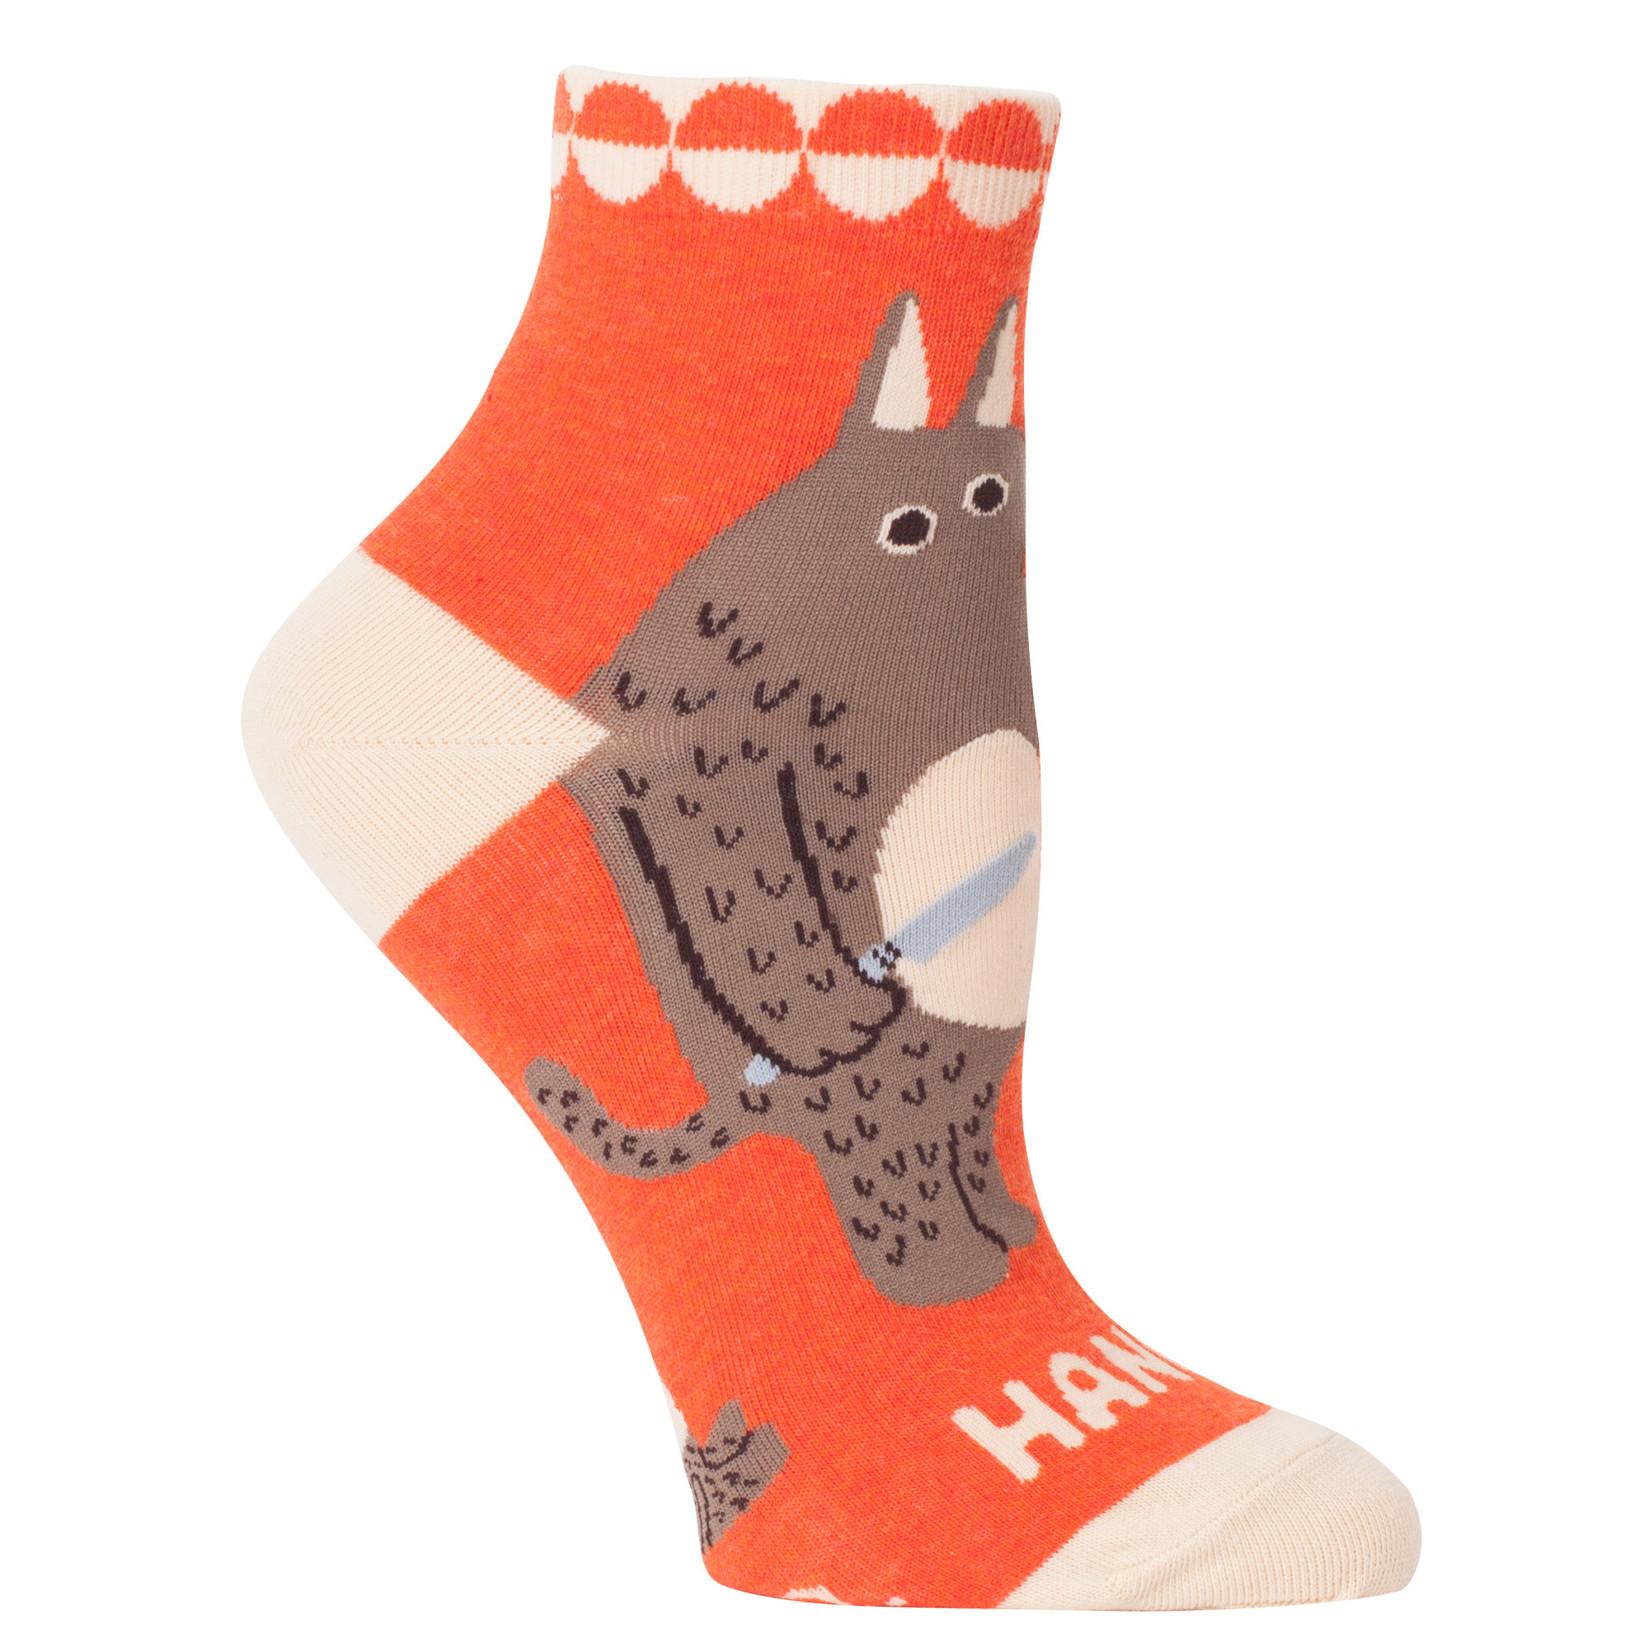 Blue Q Womens Ankle Socks - Hangry